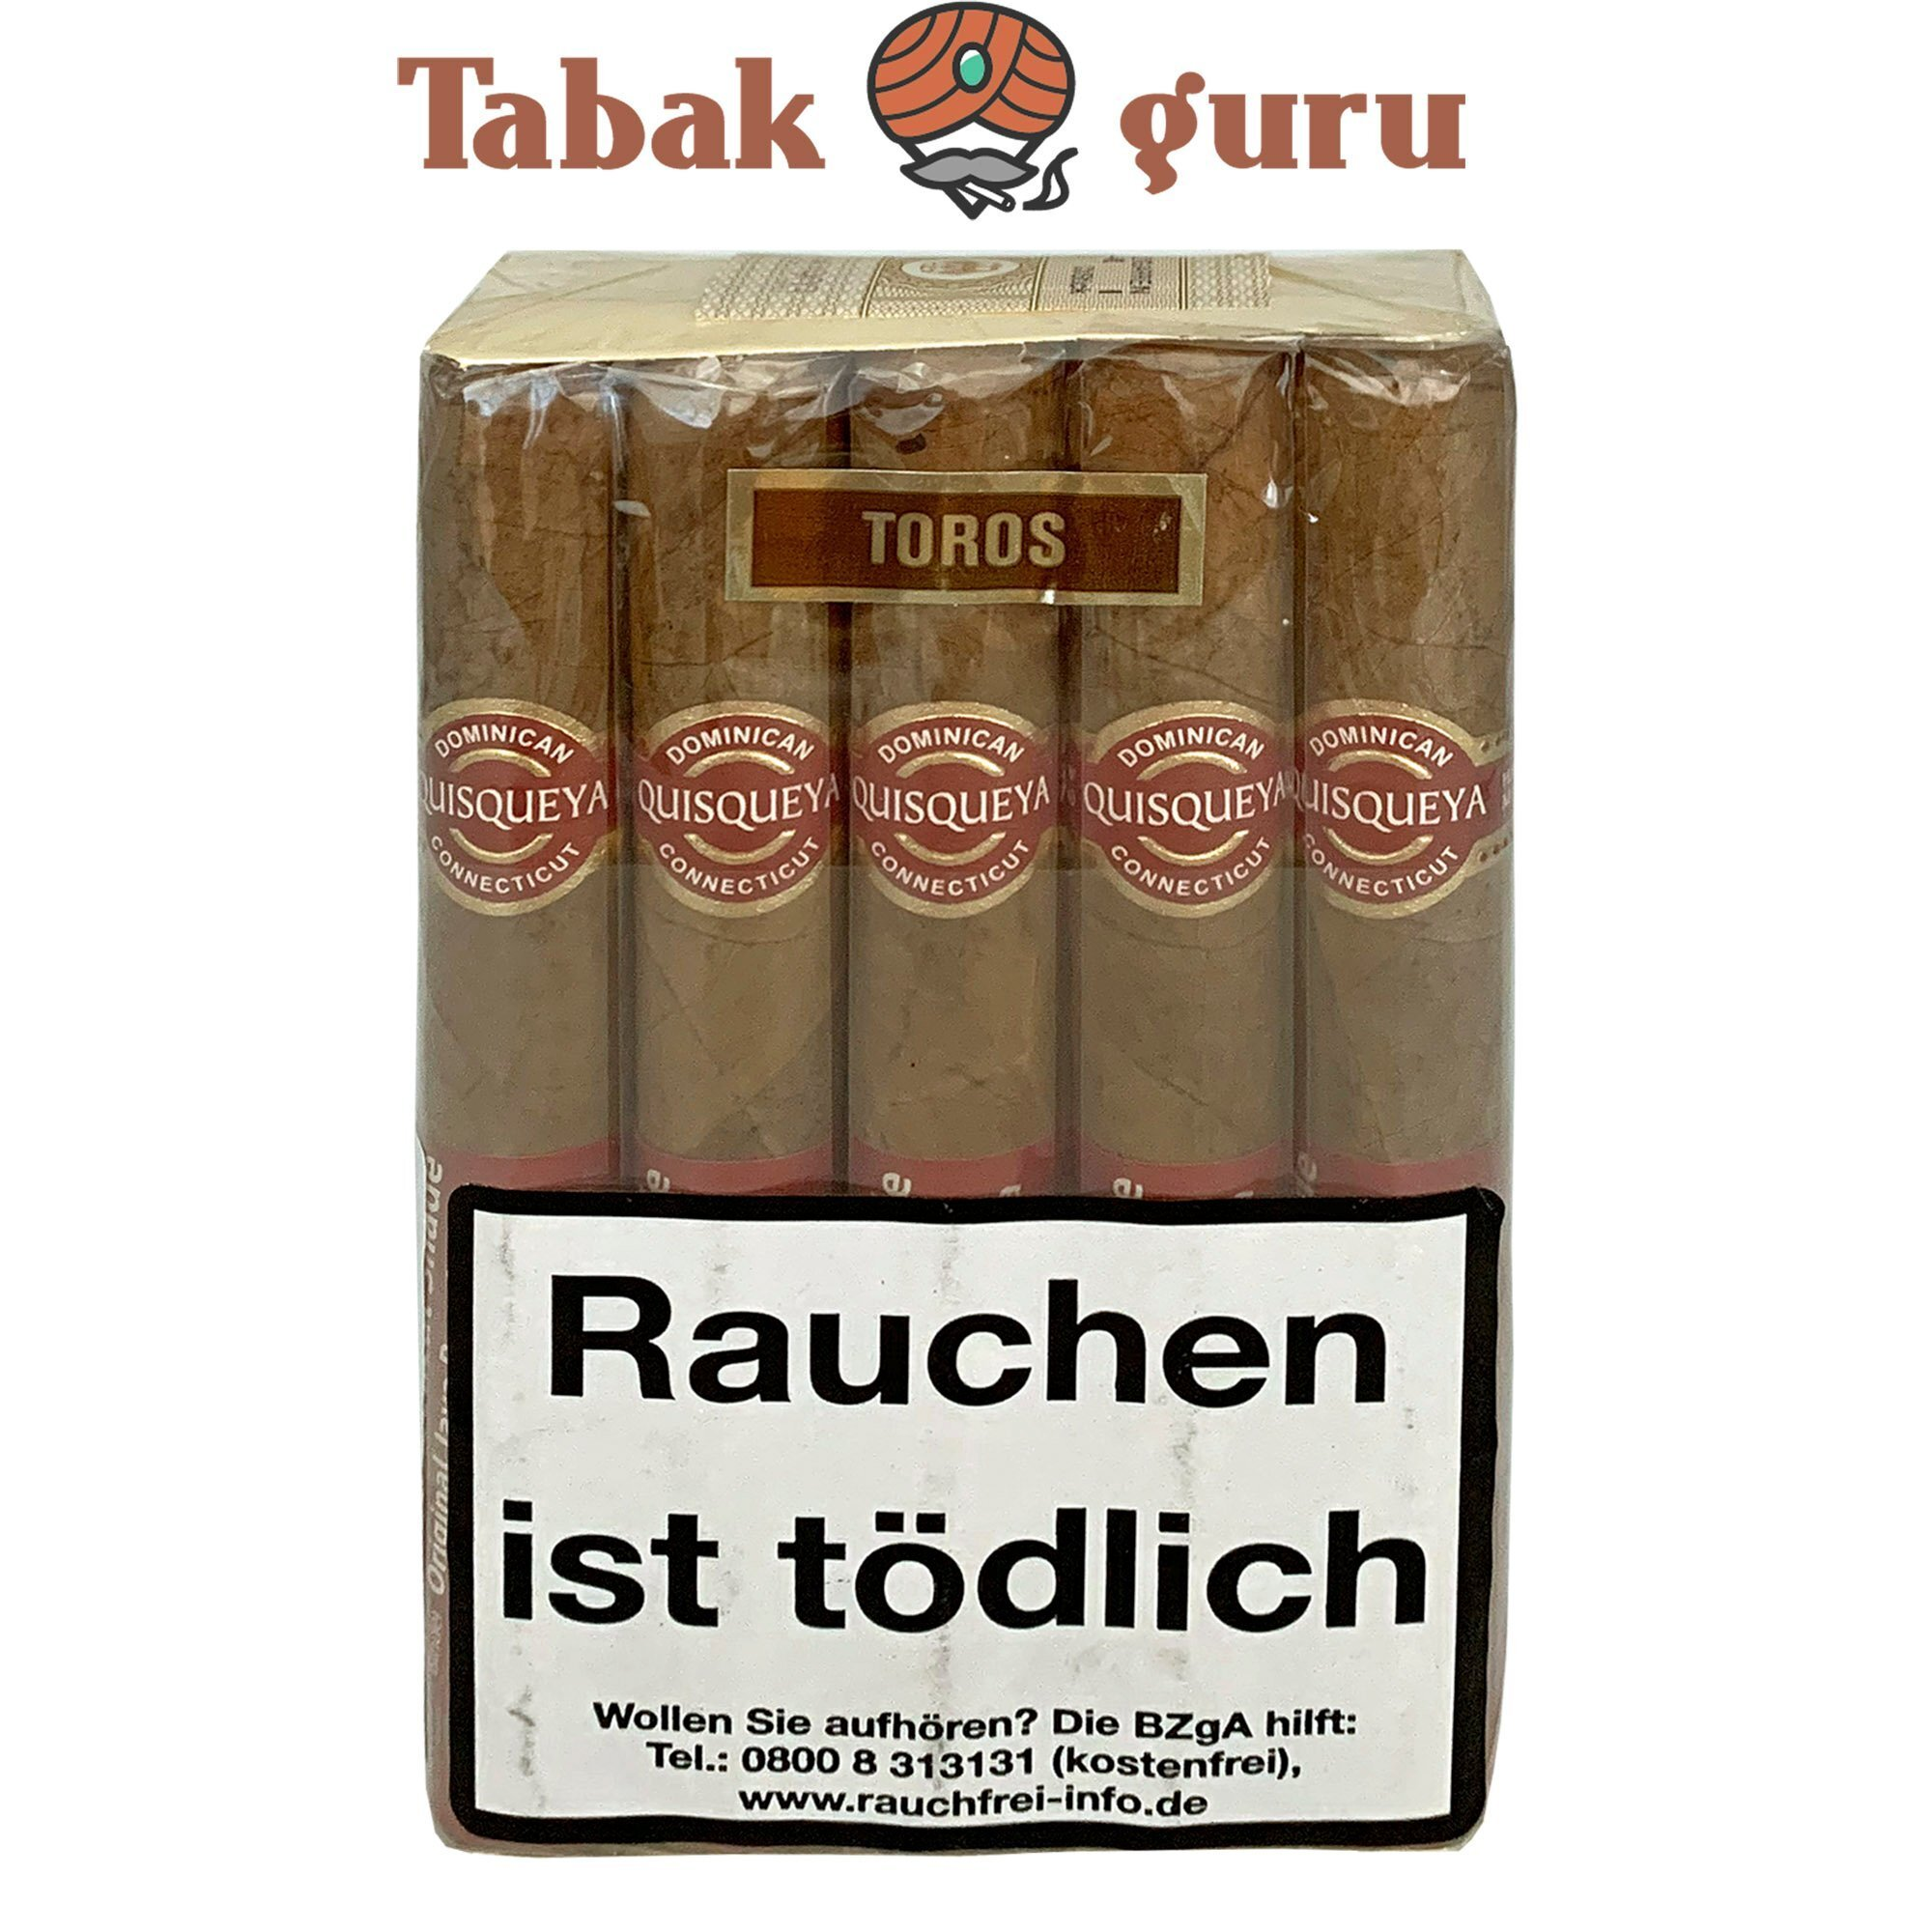 10 Quisqueya Connecticut Zigarren im Toro Format